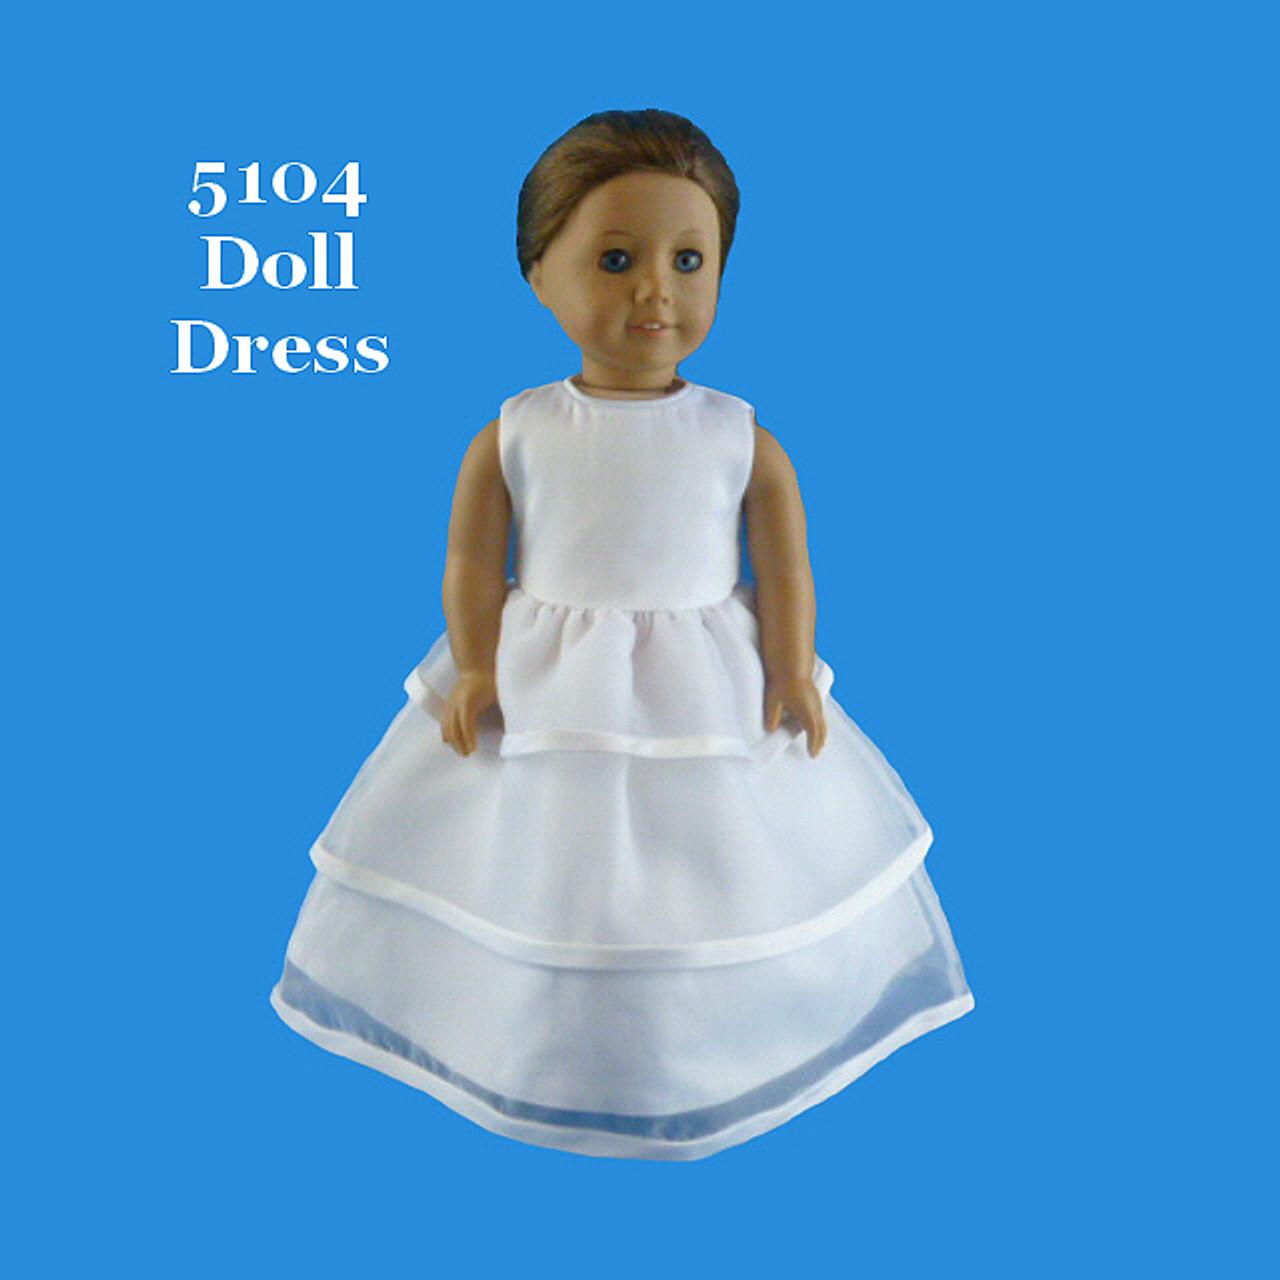 Rosebud Fashions Flower Girl Dresses Style 5104 - Upgrade